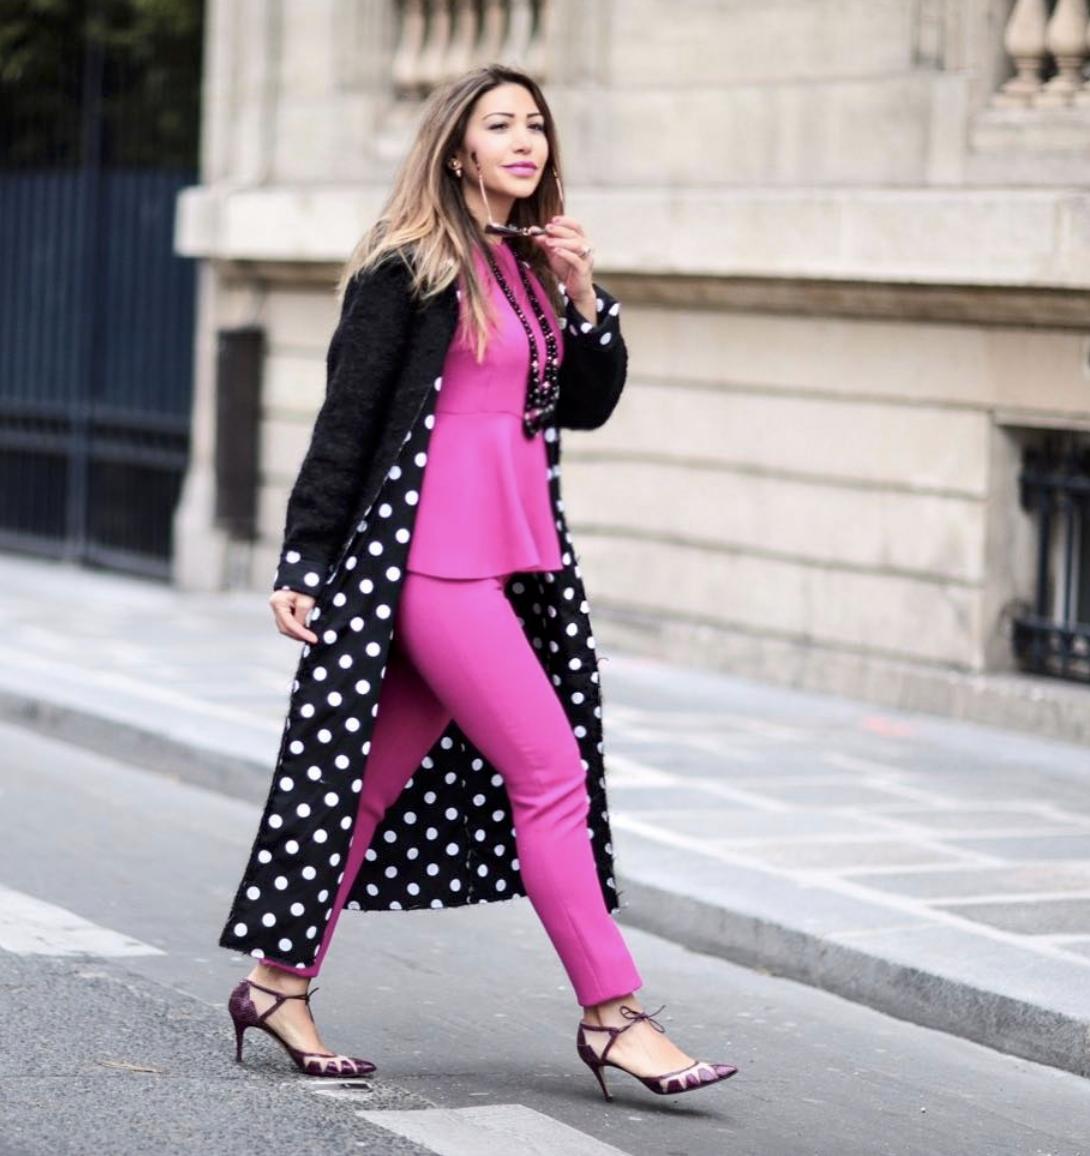 @ mayawilliamz   Full look by  @nataliakaut . Photo by:  @edwardspict    #FashionLollipop   #HotPink   #NataliaKaut  #PolkadotCoat   #styleinspo   #BiondaCastana